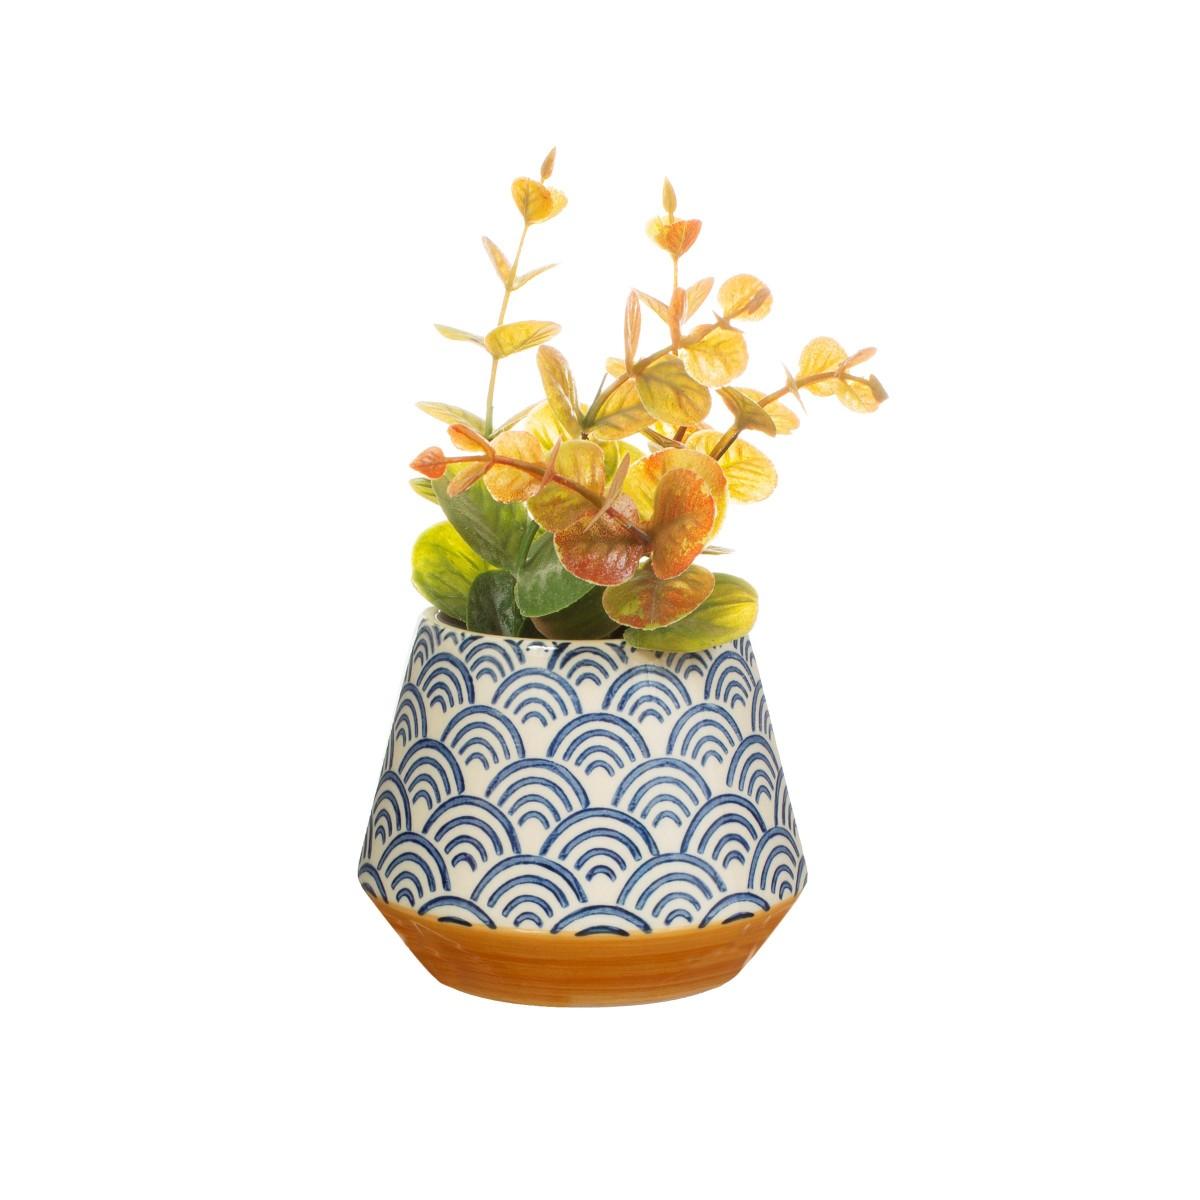 Plantenkamer-sass-belle-large-wavey-print-planter.jpg